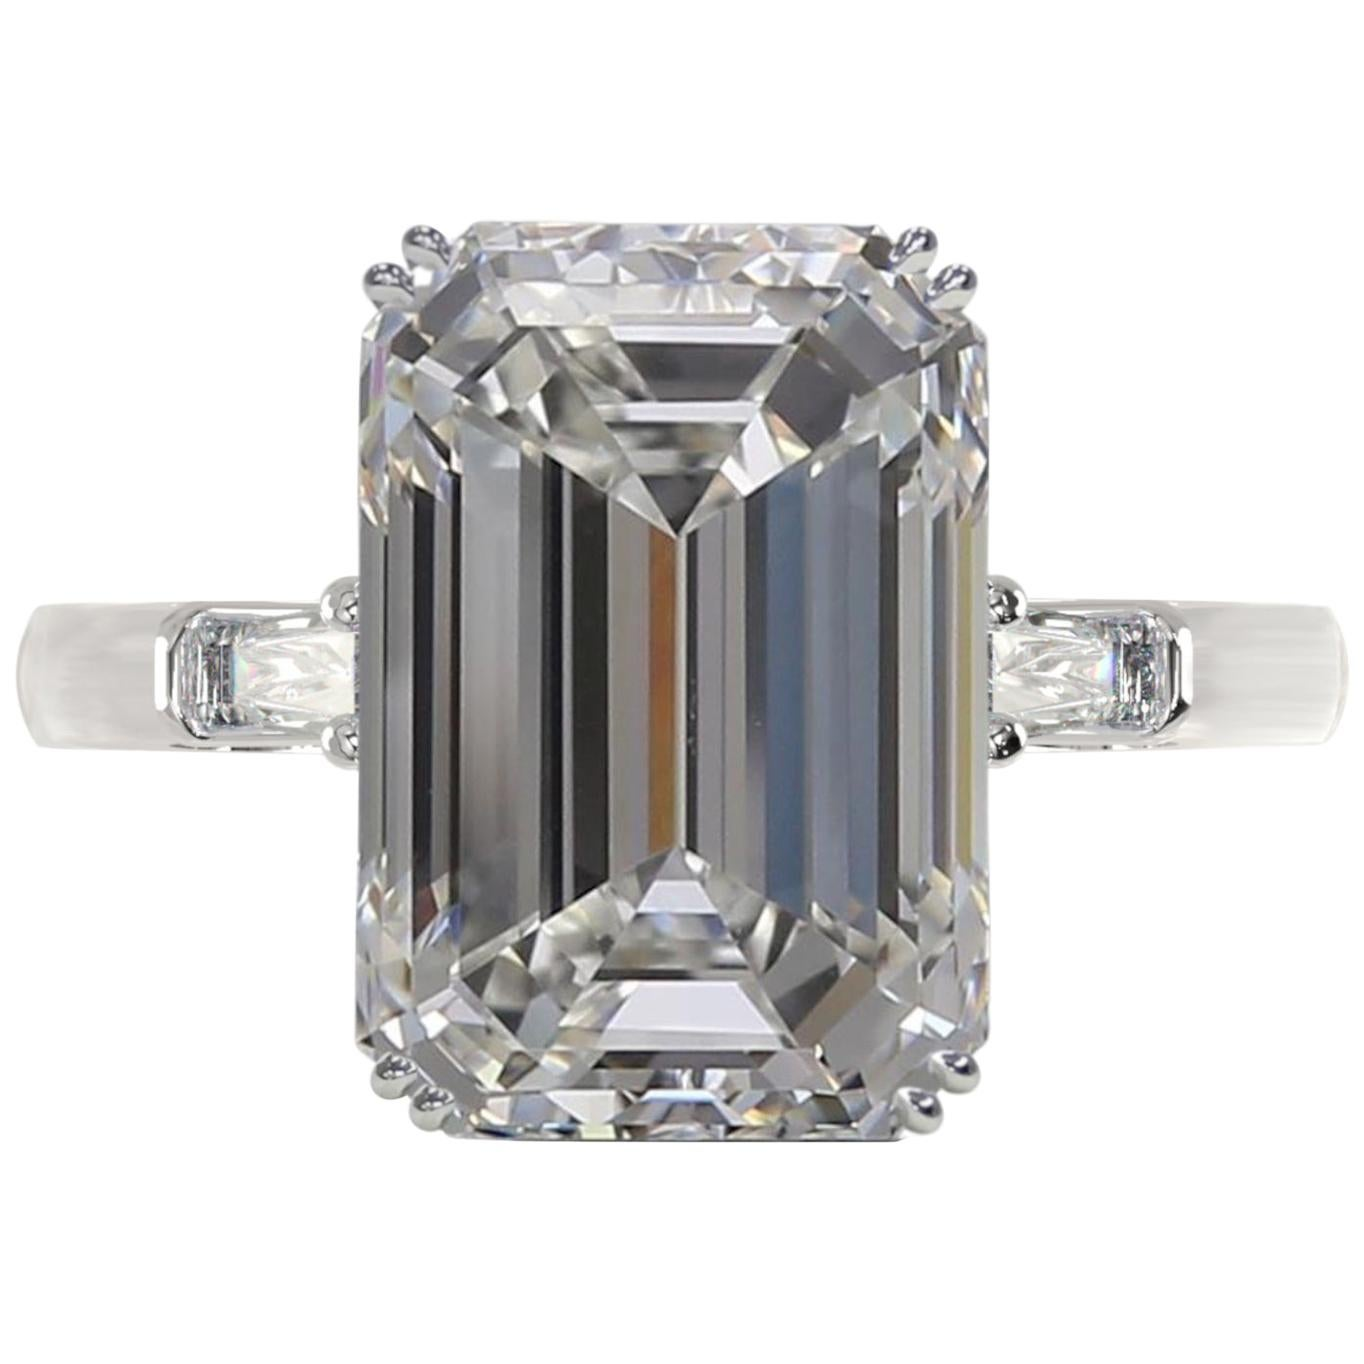 GIA Certified 4  Carat Emerald Cut Diamond Ring E Color VVS1 Clarity